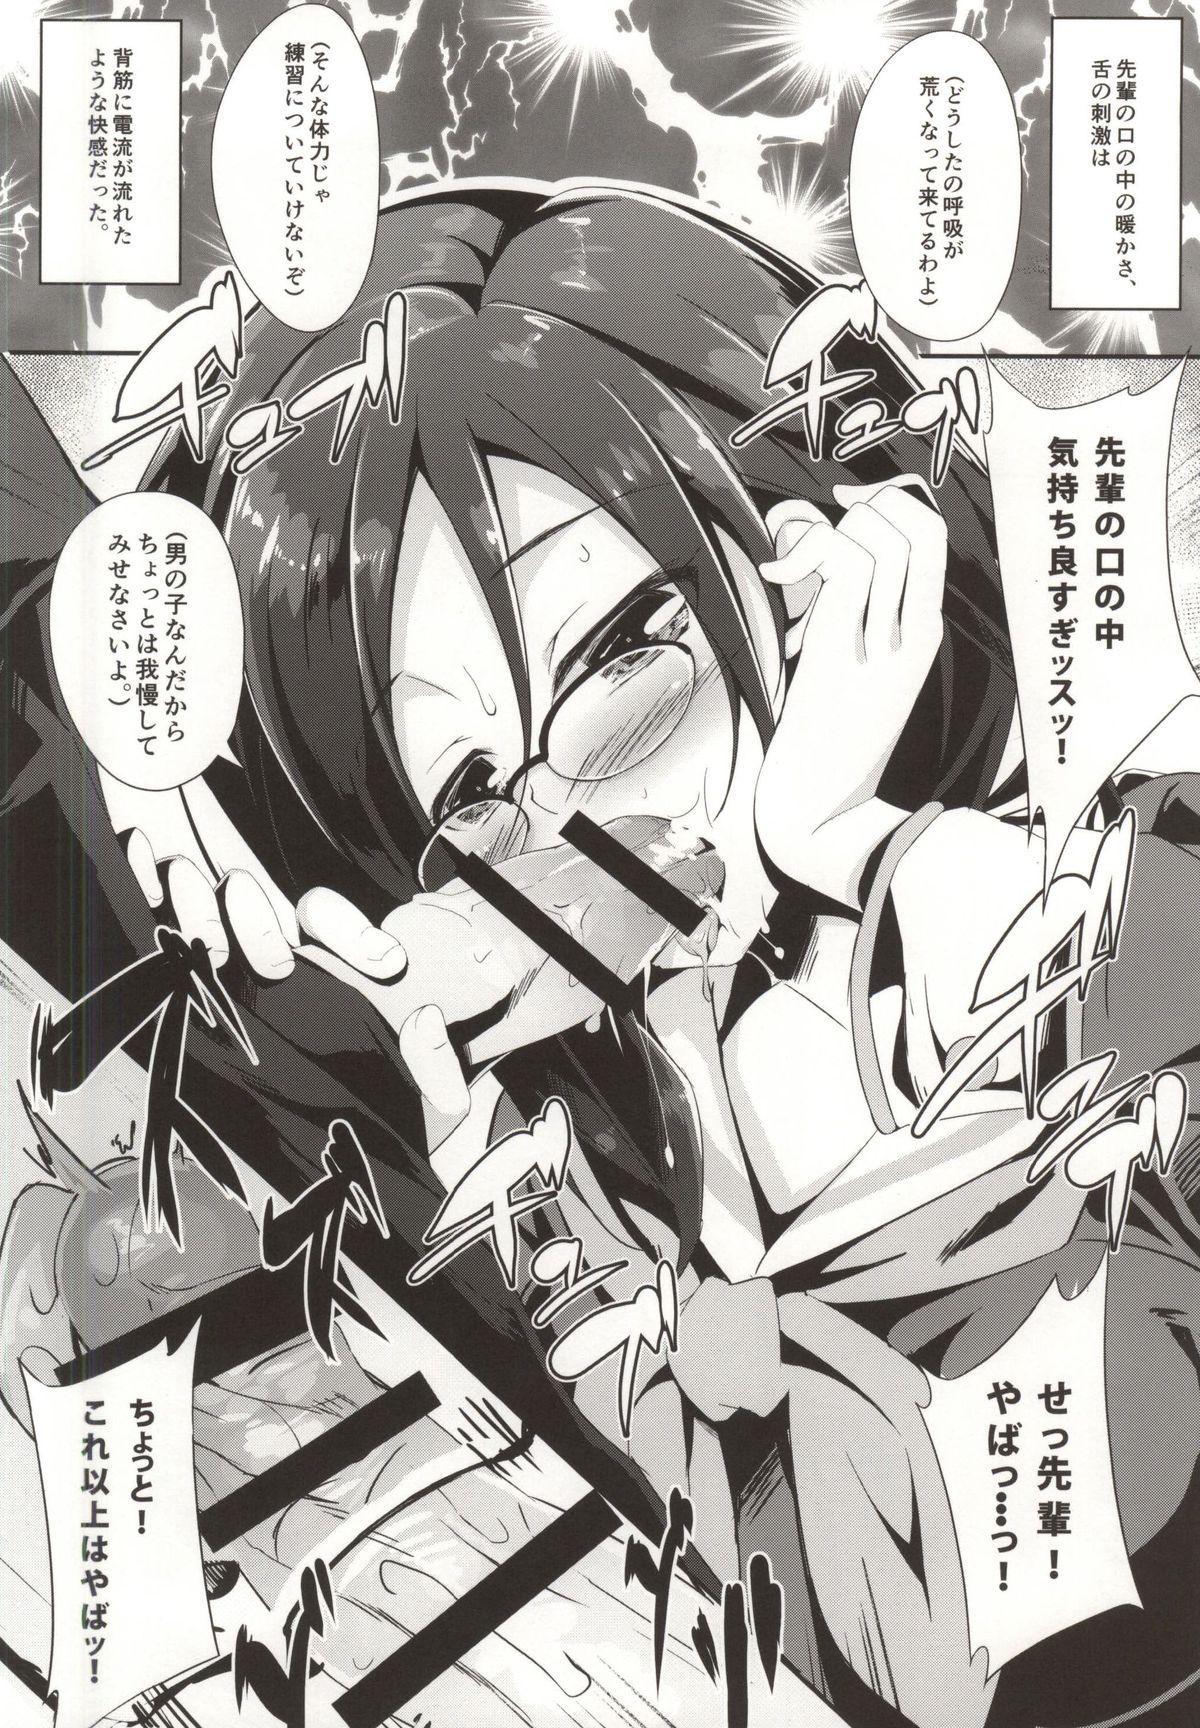 Asuka Senpai Shidou Naka 6